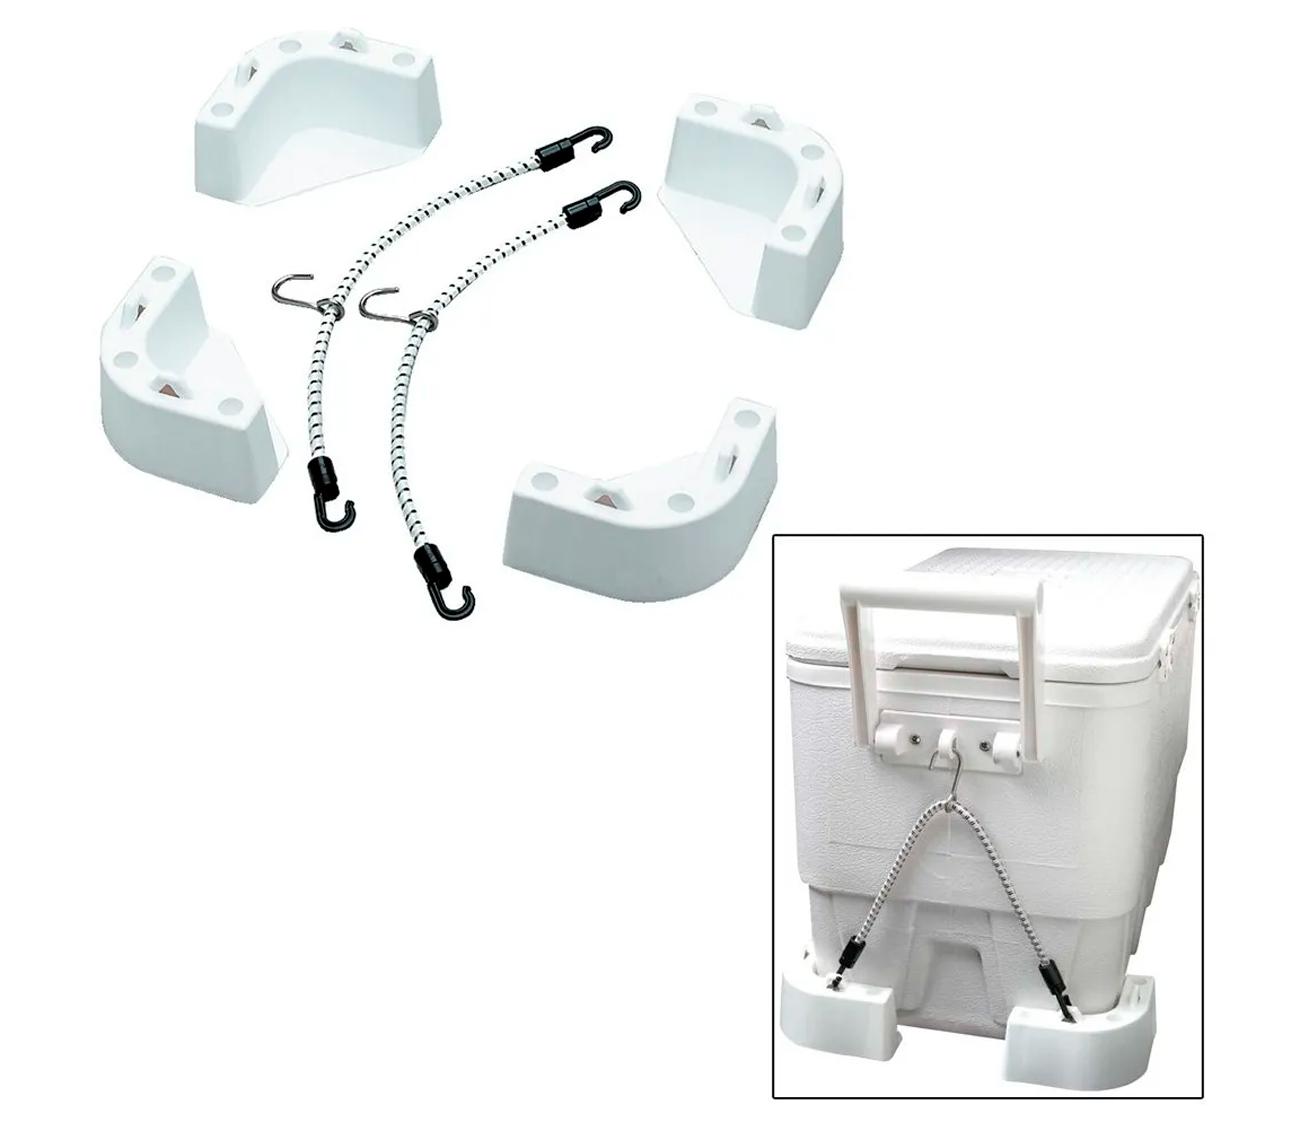 Suporte Base para Caixa Térmica Cooler Isopor Attwood para uso em Barcos Lanchas Pesca